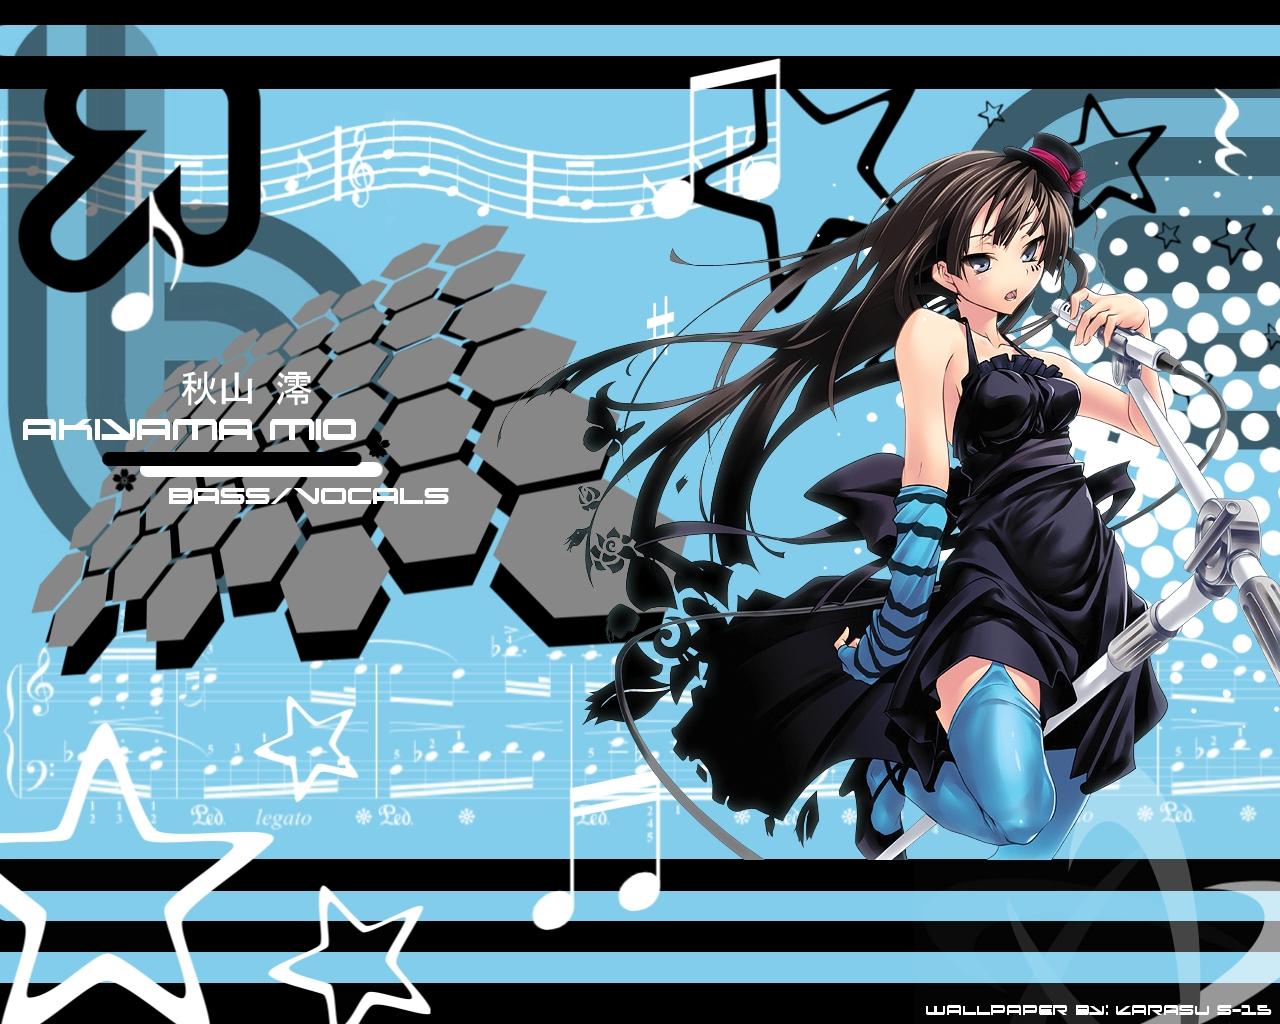 http://1.bp.blogspot.com/-_Wz0X3lfM5A/TpwLCVV17OI/AAAAAAAAAbo/OTqNDV57bHc/s1600/K_On__Mio_wallpaper_by_Karasu_S15.jpg